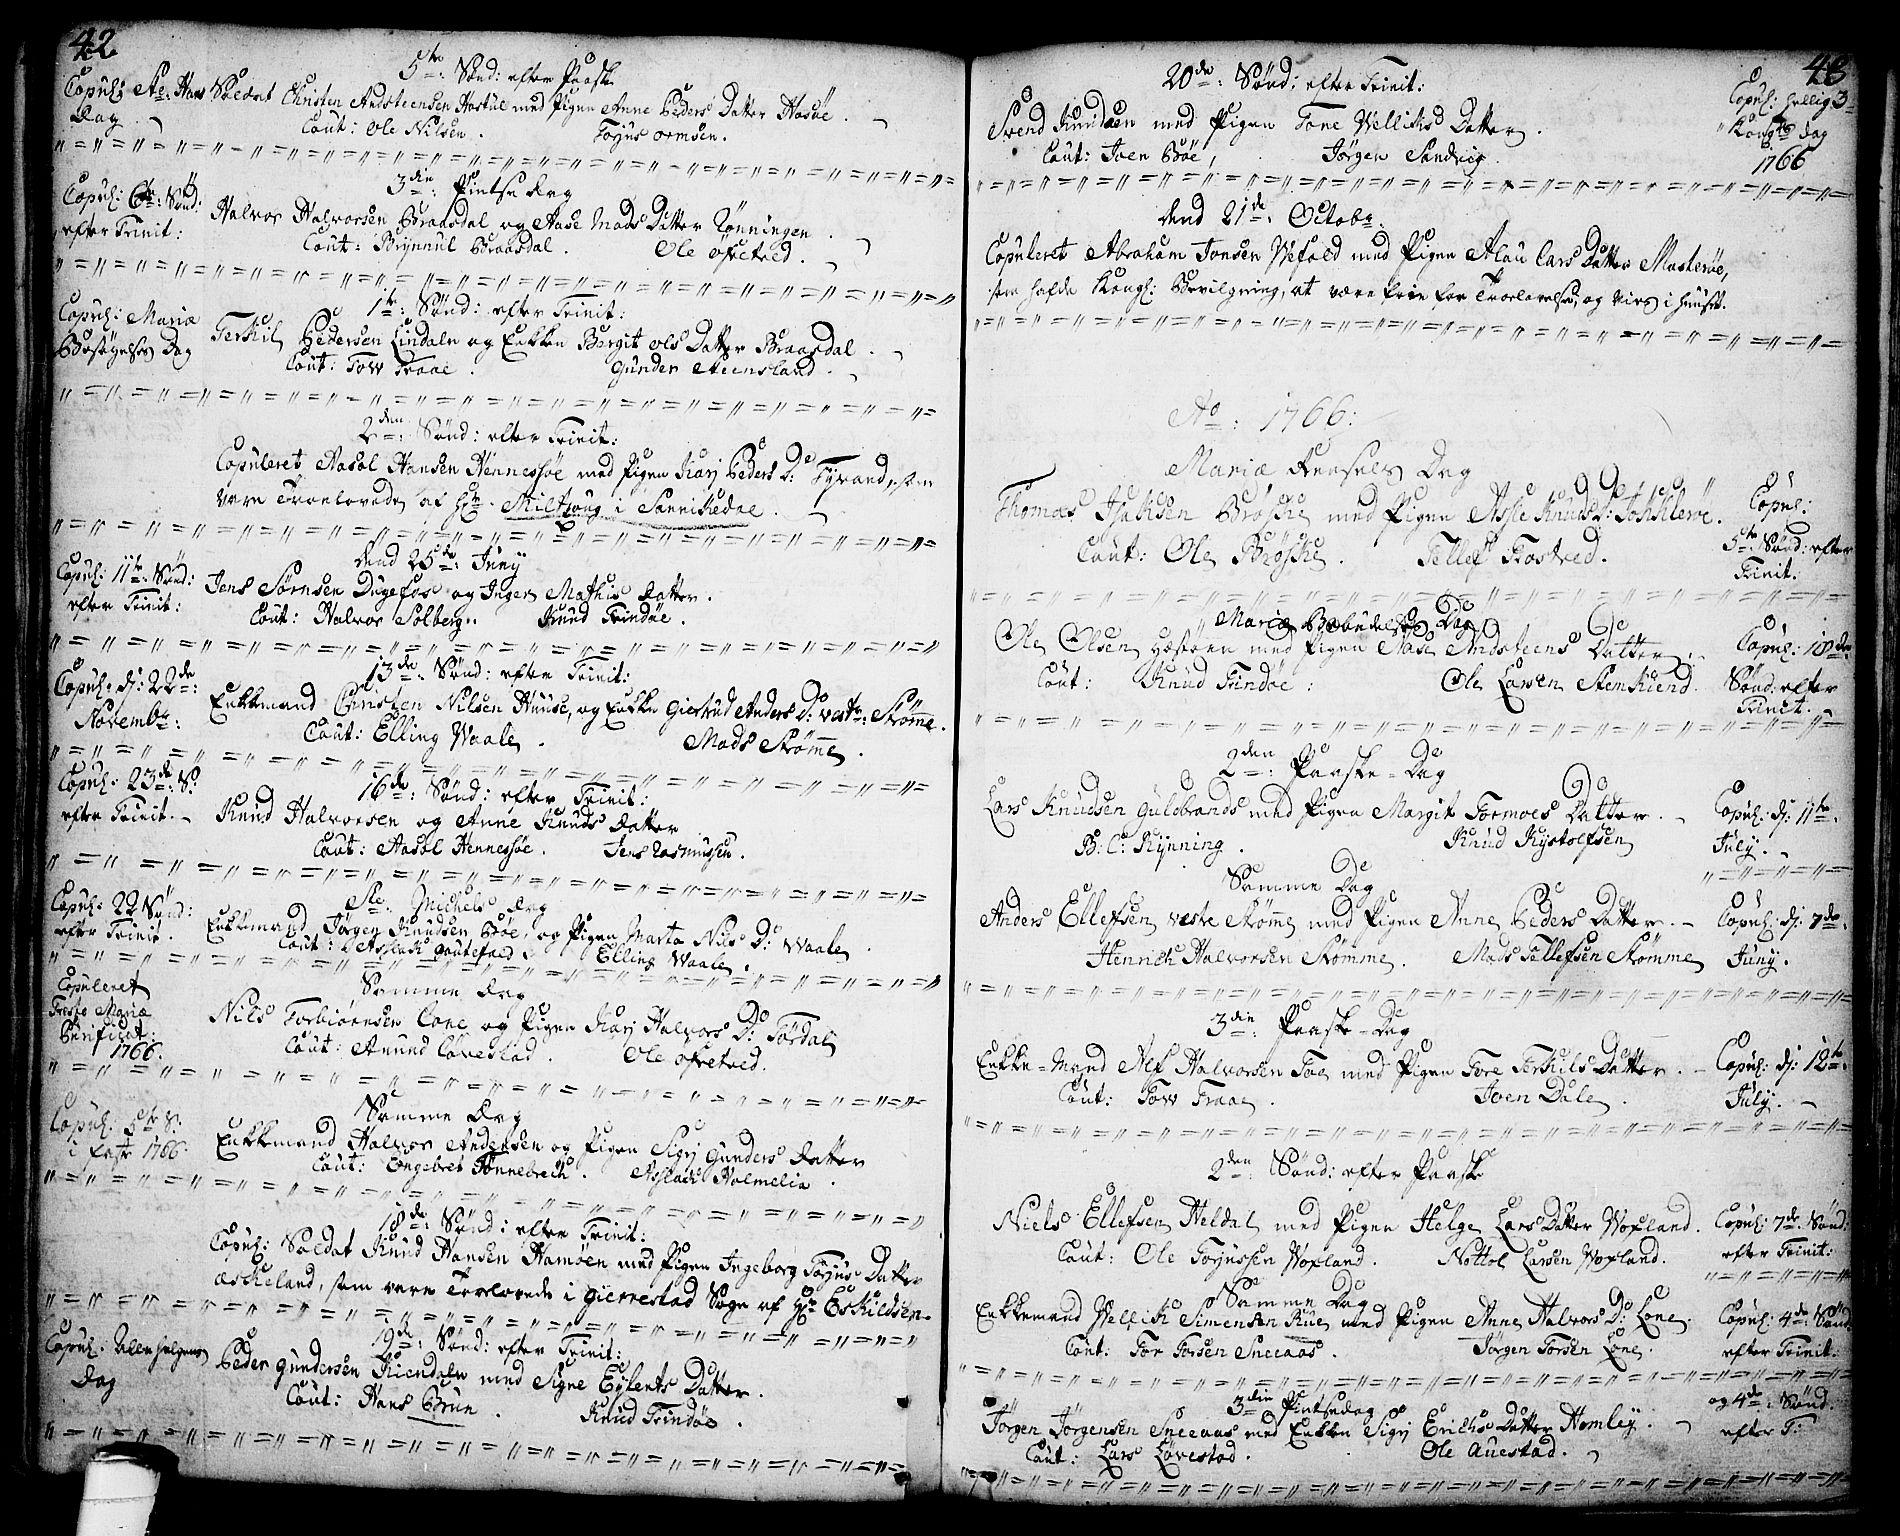 SAKO, Drangedal kirkebøker, F/Fa/L0001: Ministerialbok nr. 1, 1697-1767, s. 42-43